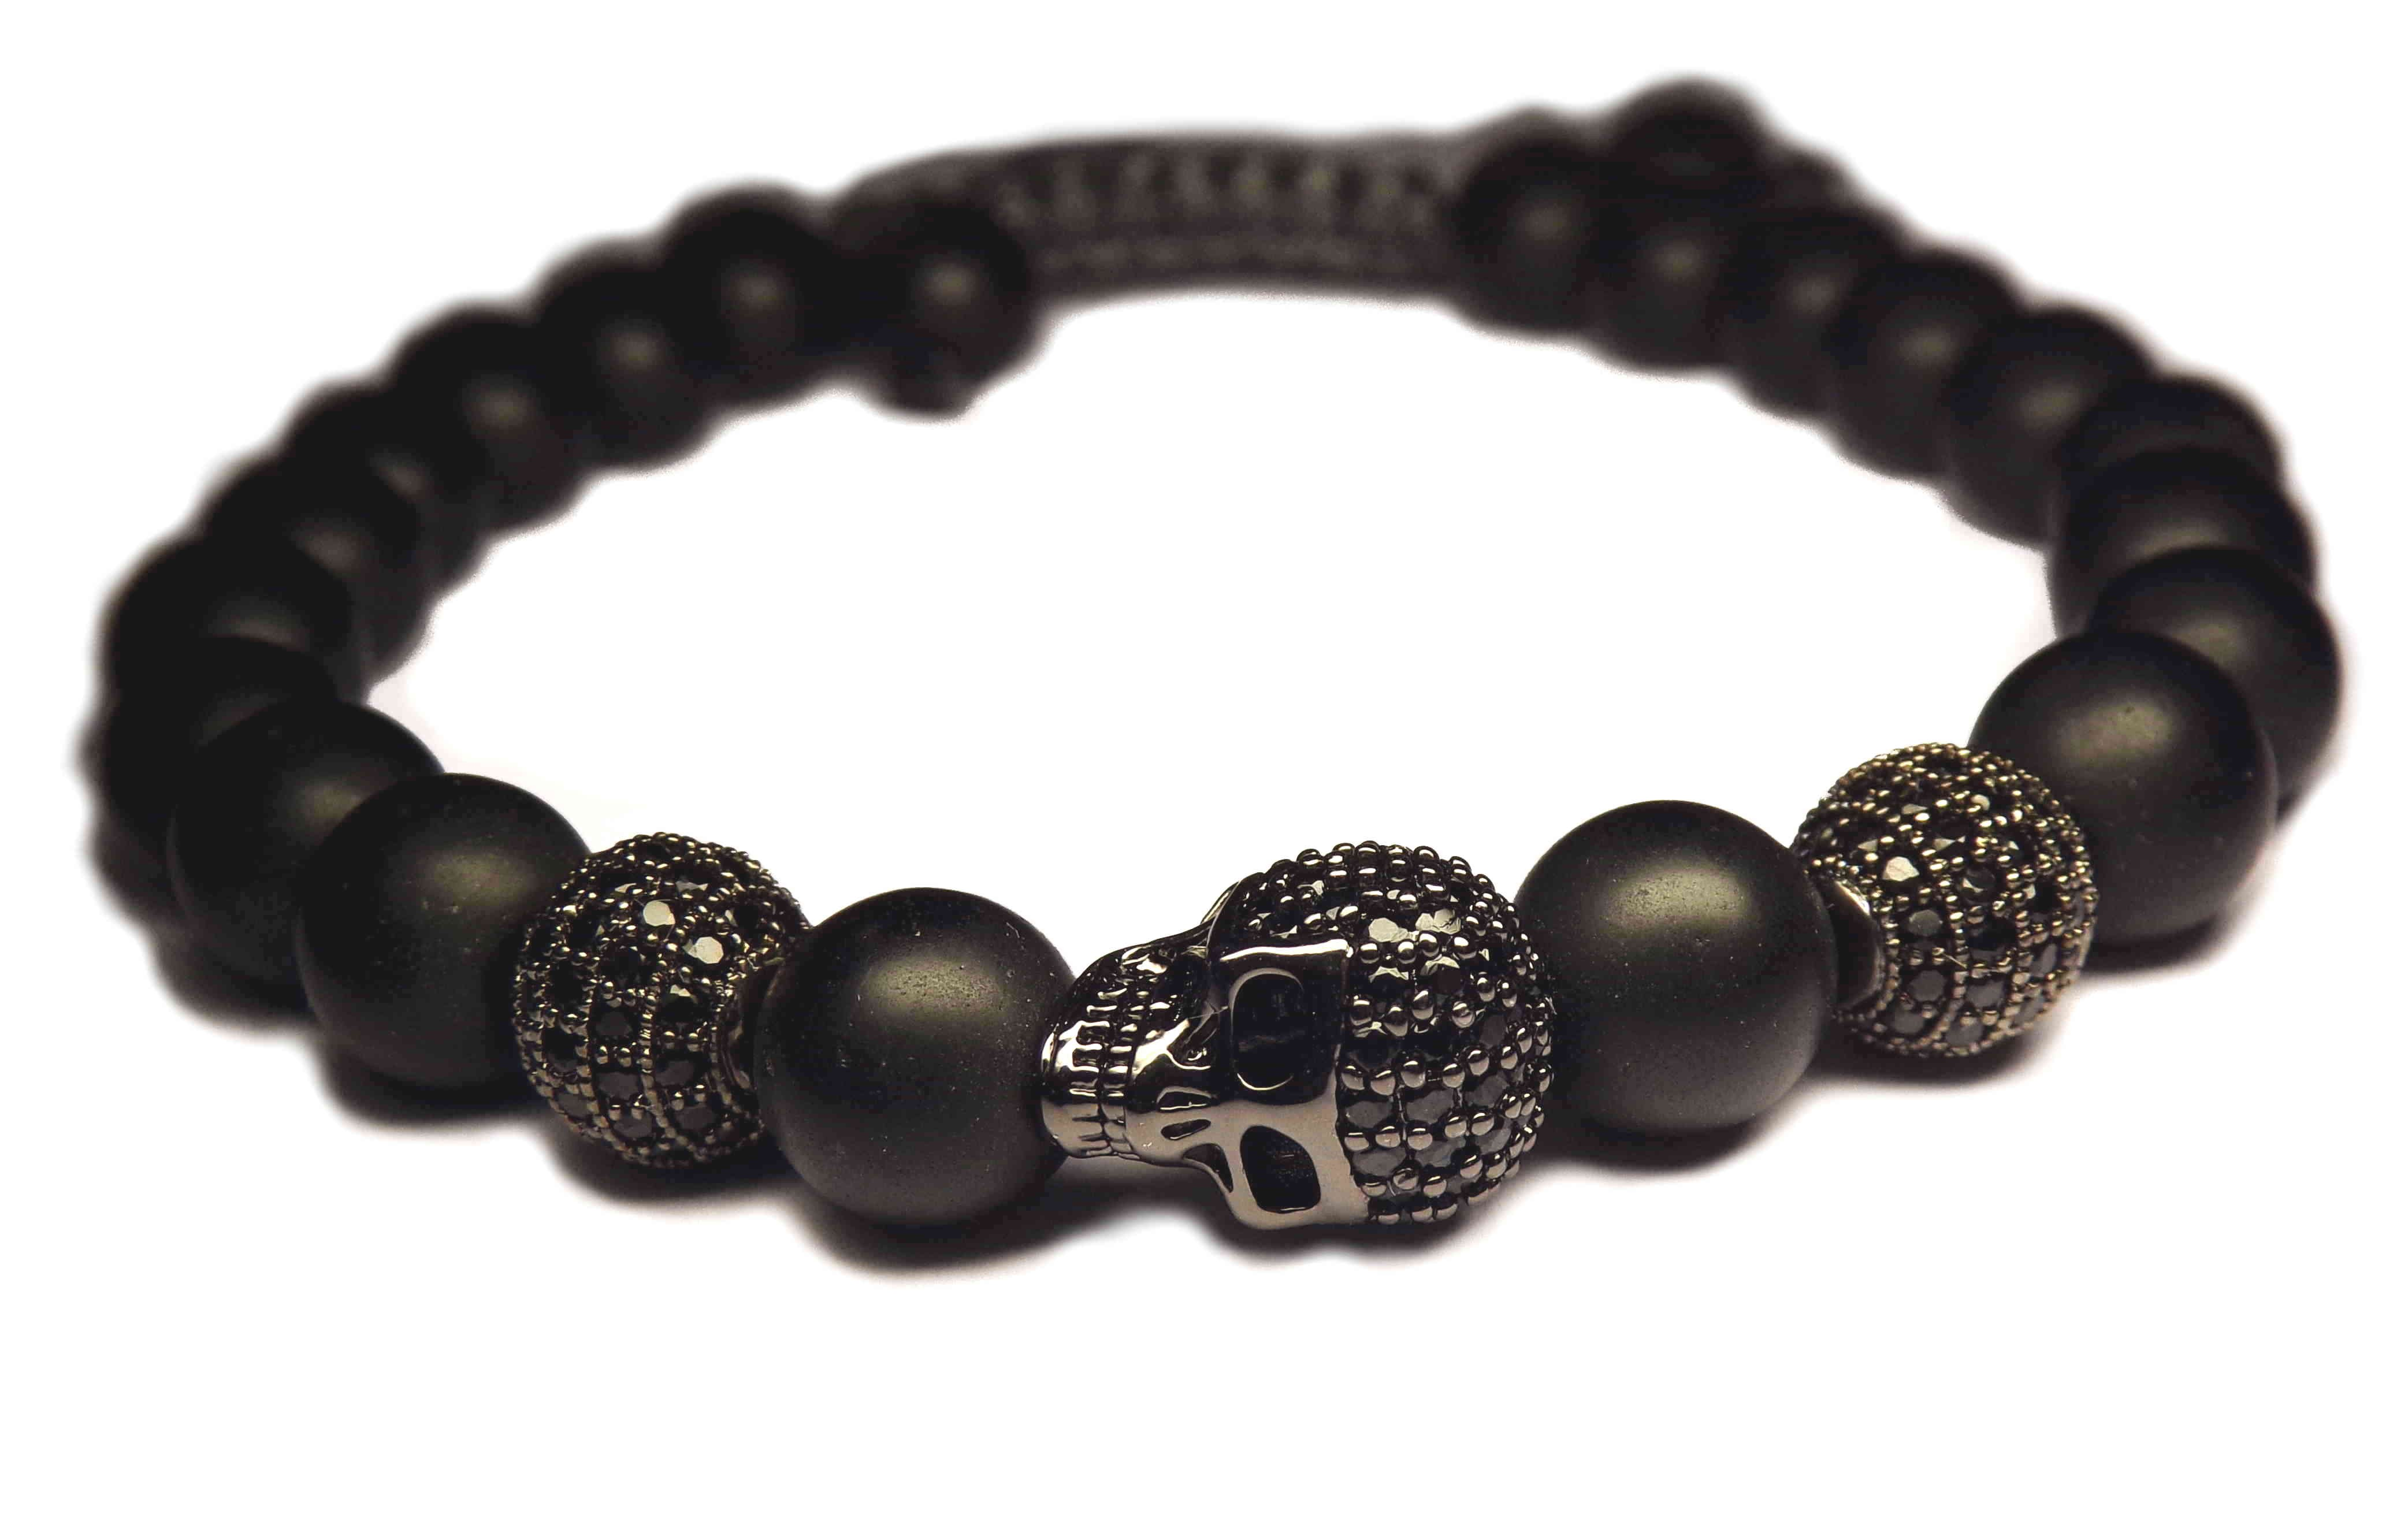 shamballa bracelet tete de mort noir et perles noir onyx. Black Bedroom Furniture Sets. Home Design Ideas